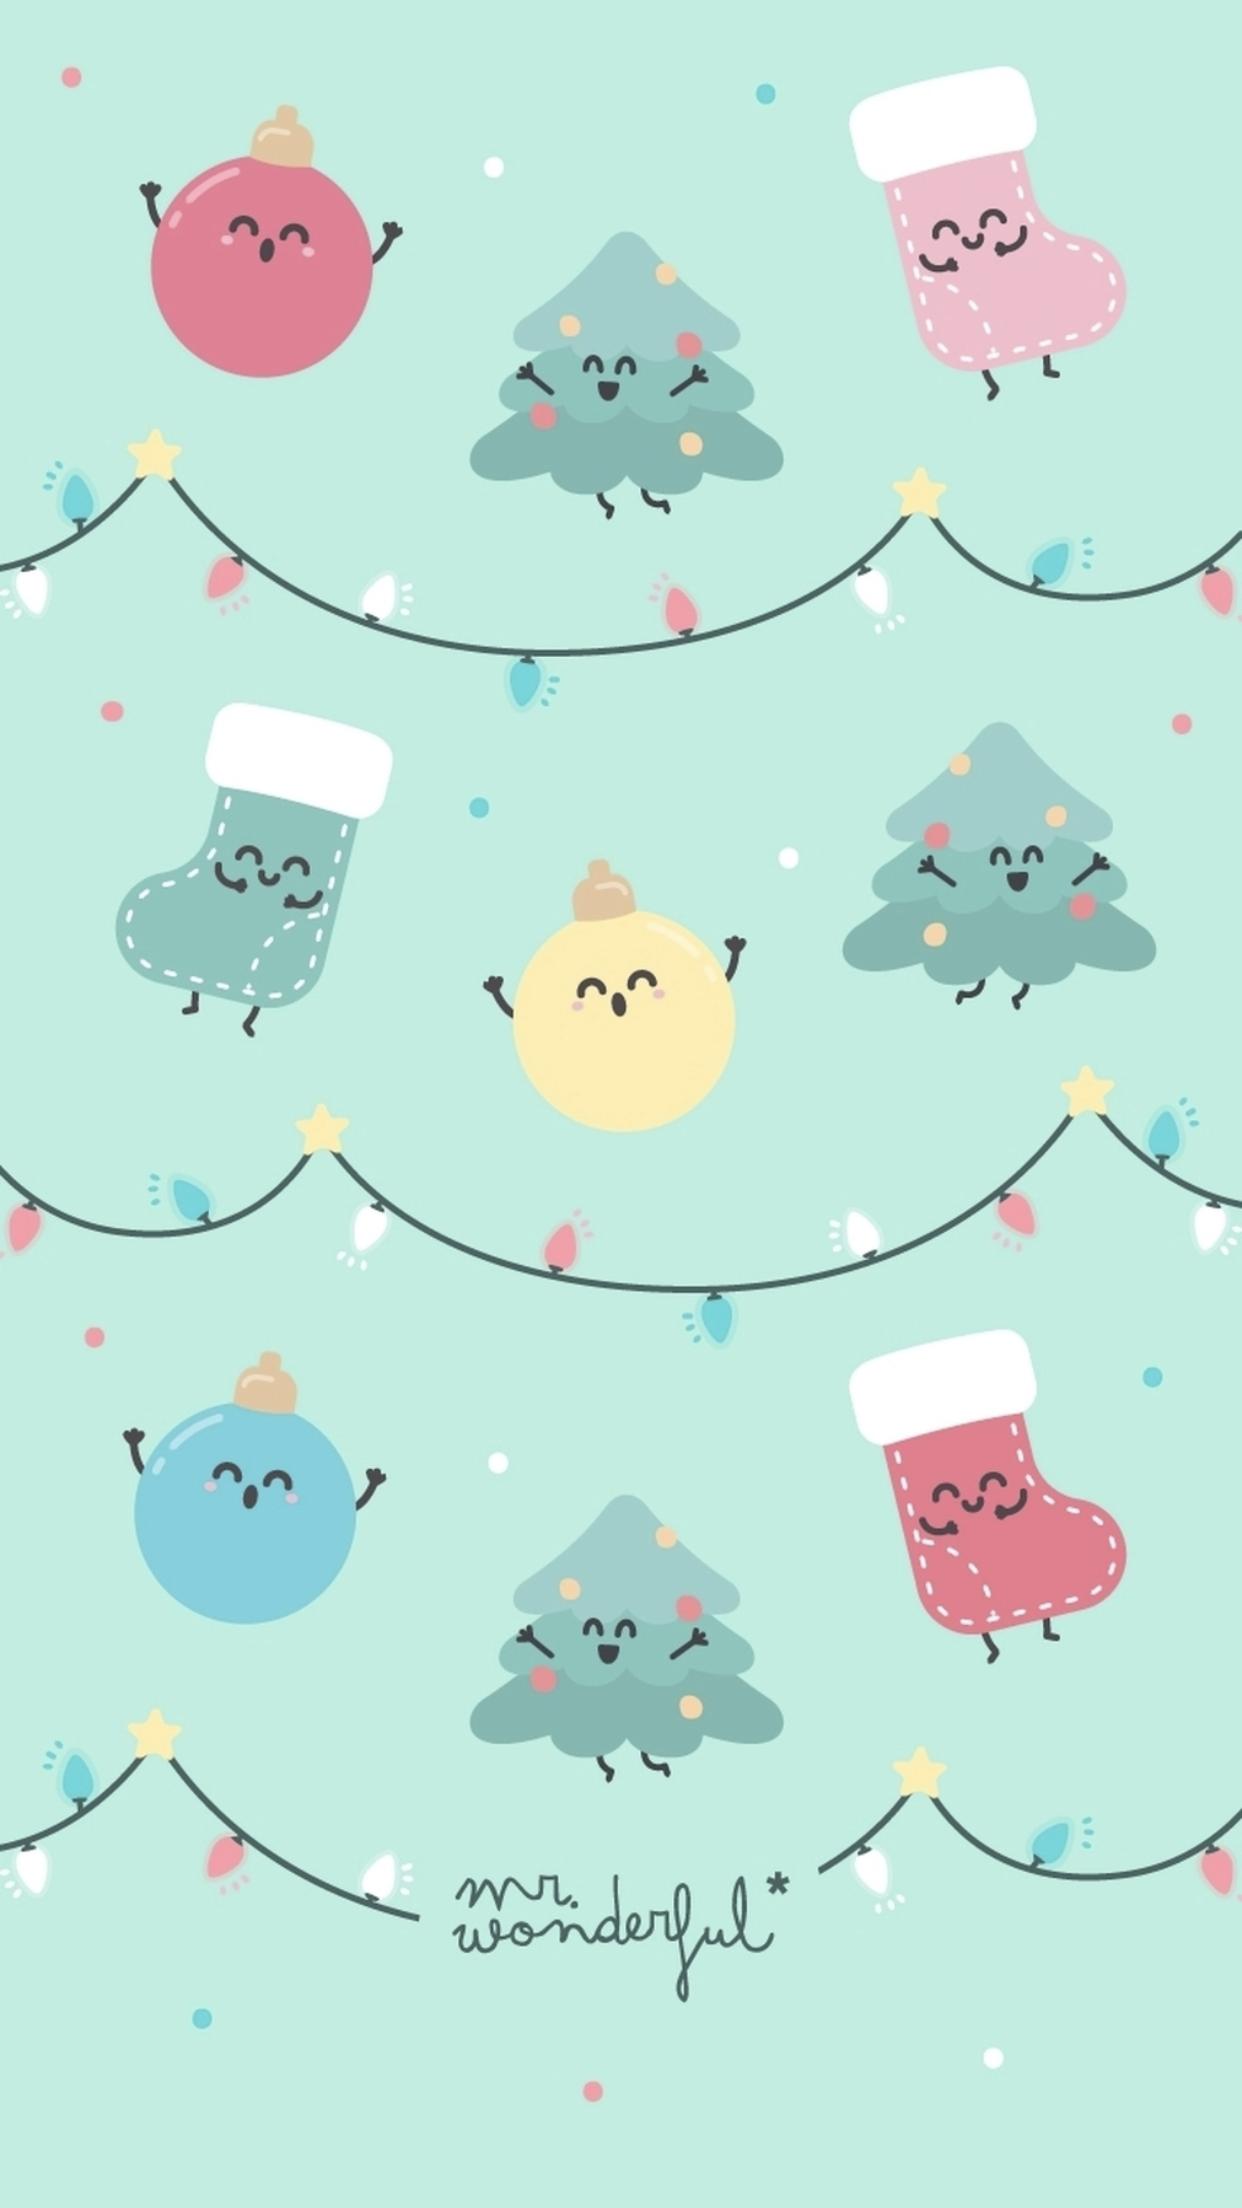 mrwonderful  mrwonderfulwallpaper  christmas  christmaswallpaper  screensaver  christmastree  wallpaper  stocking  baubles  merrychristmas